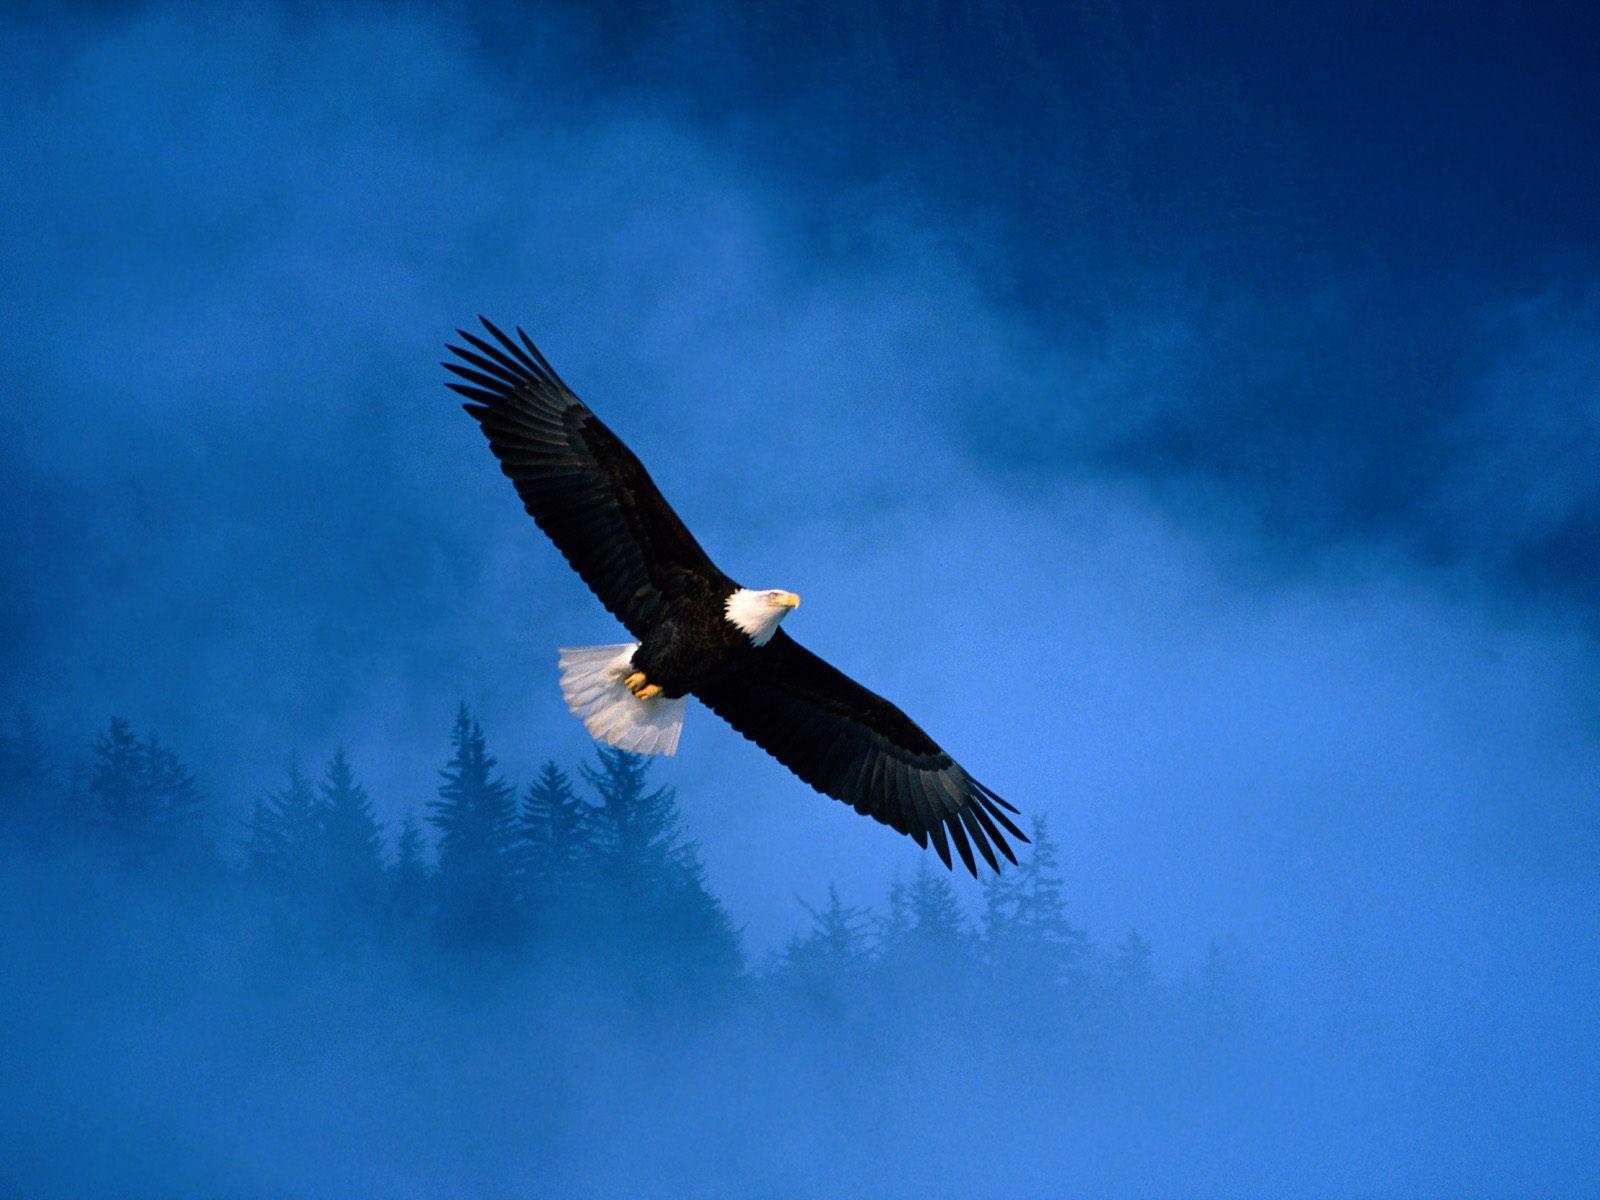 Bald Eagle Pictures   1600x1200 Hd Desktop Wallpaper 1600x1200